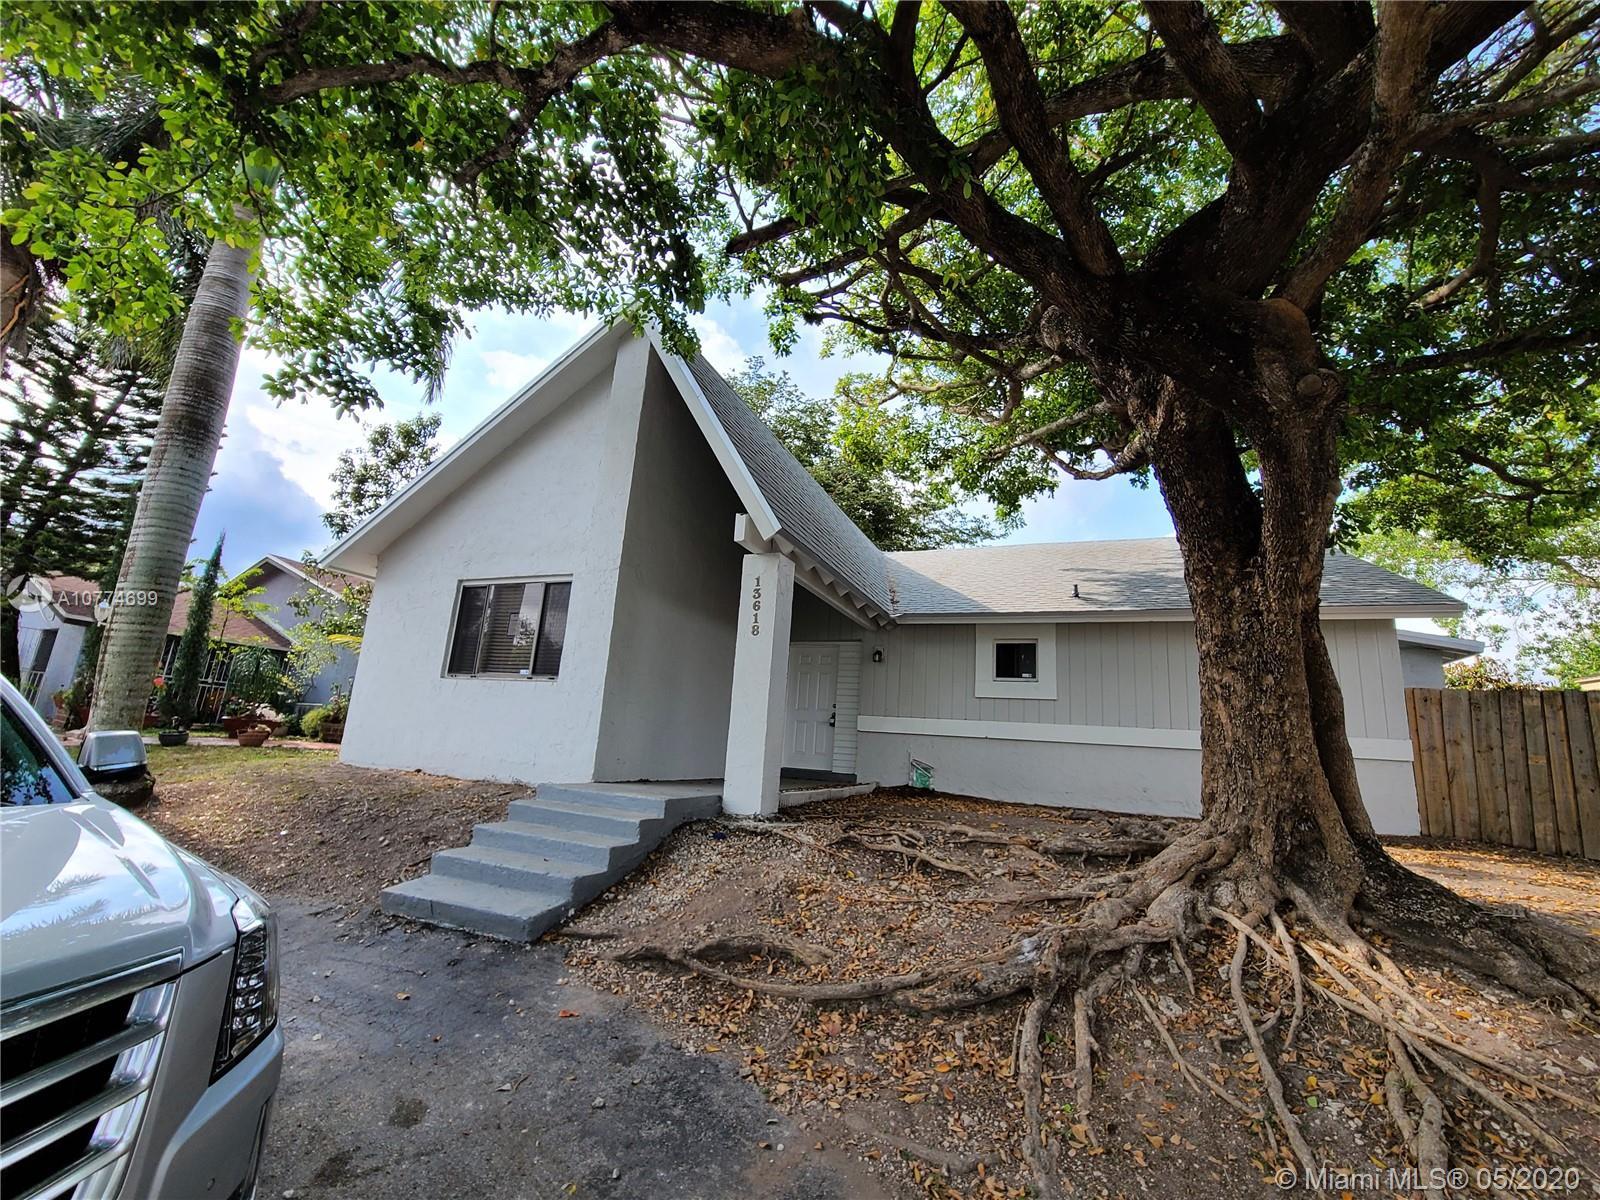 13618 SW 287th Ter, Homestead, FL 33033 - Homestead, FL real estate listing